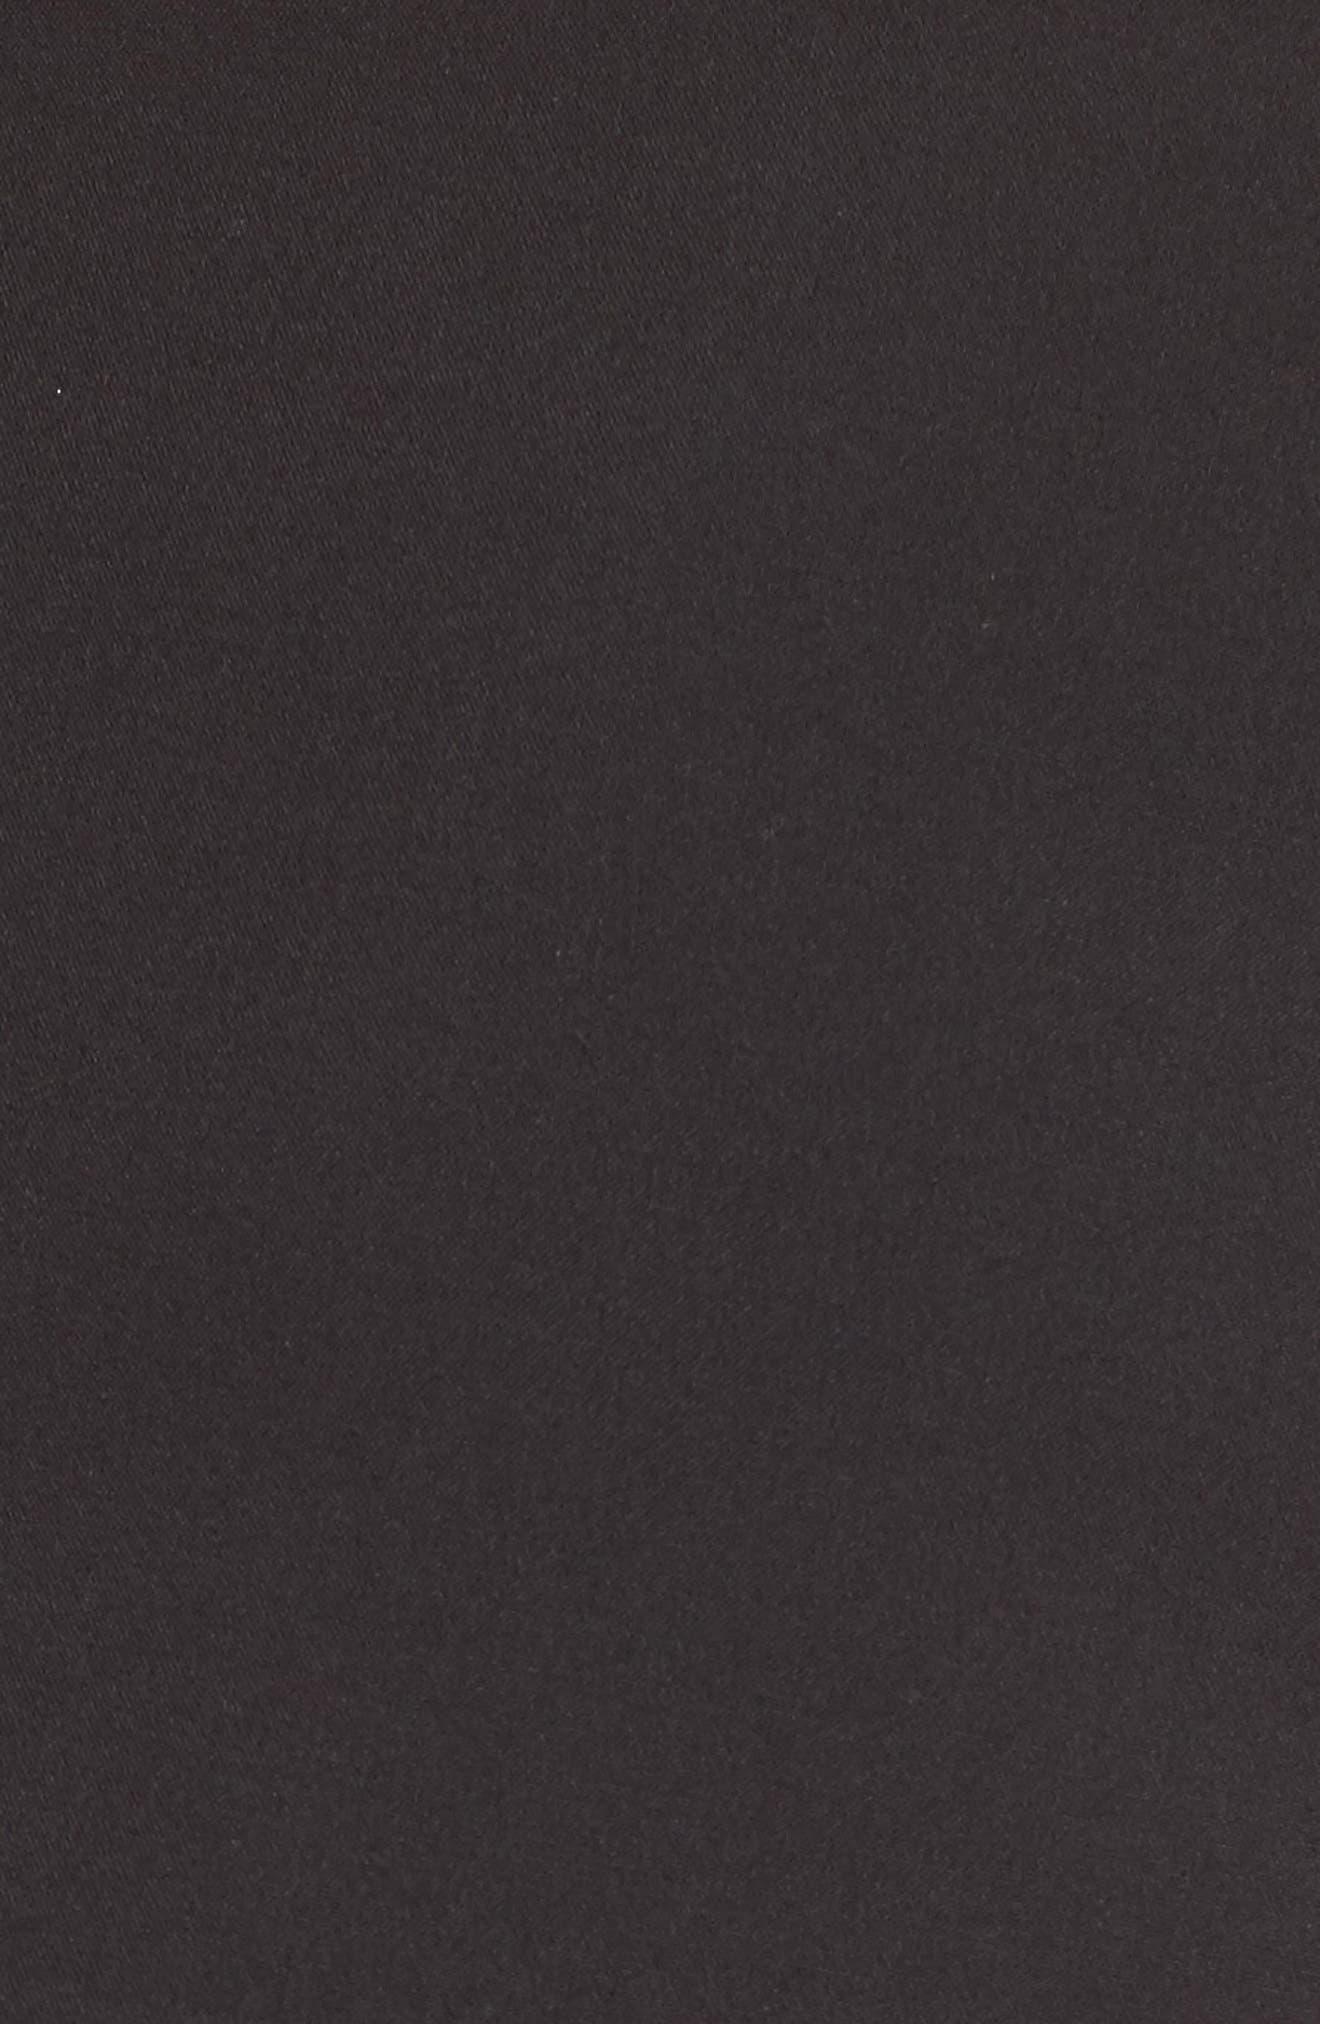 Popover Midi Dress,                             Alternate thumbnail 6, color,                             BLACK